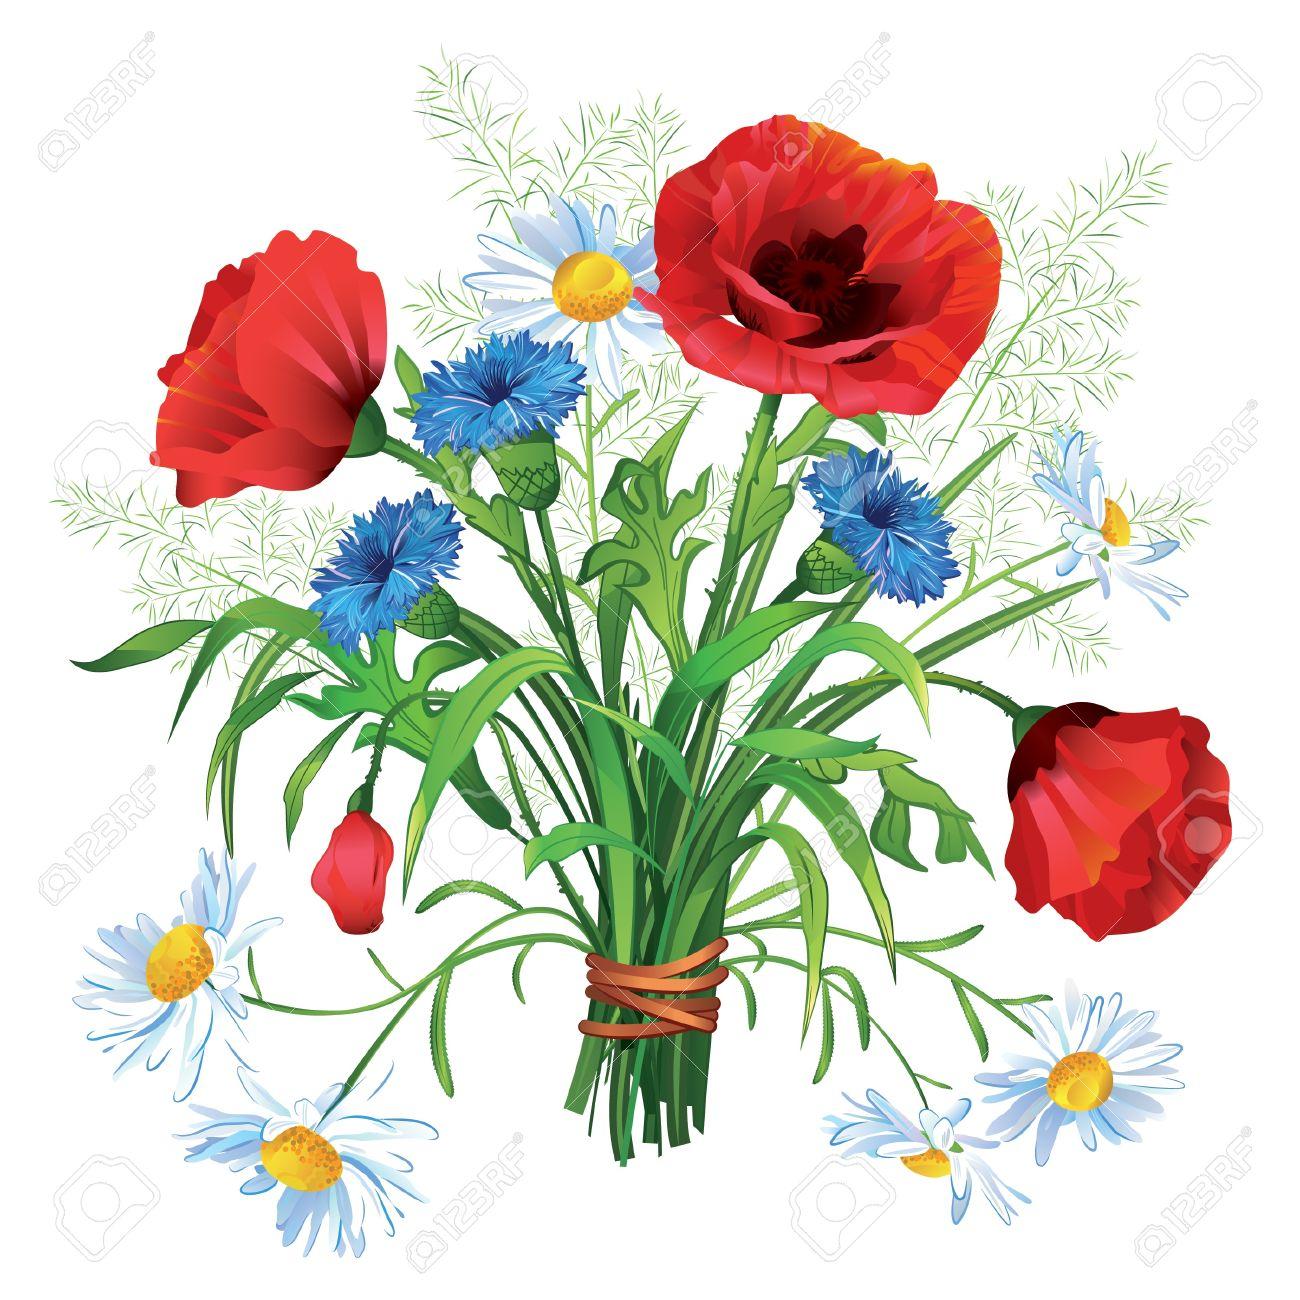 1300x1300 Wildflower Clipart Sunflower Bouquet